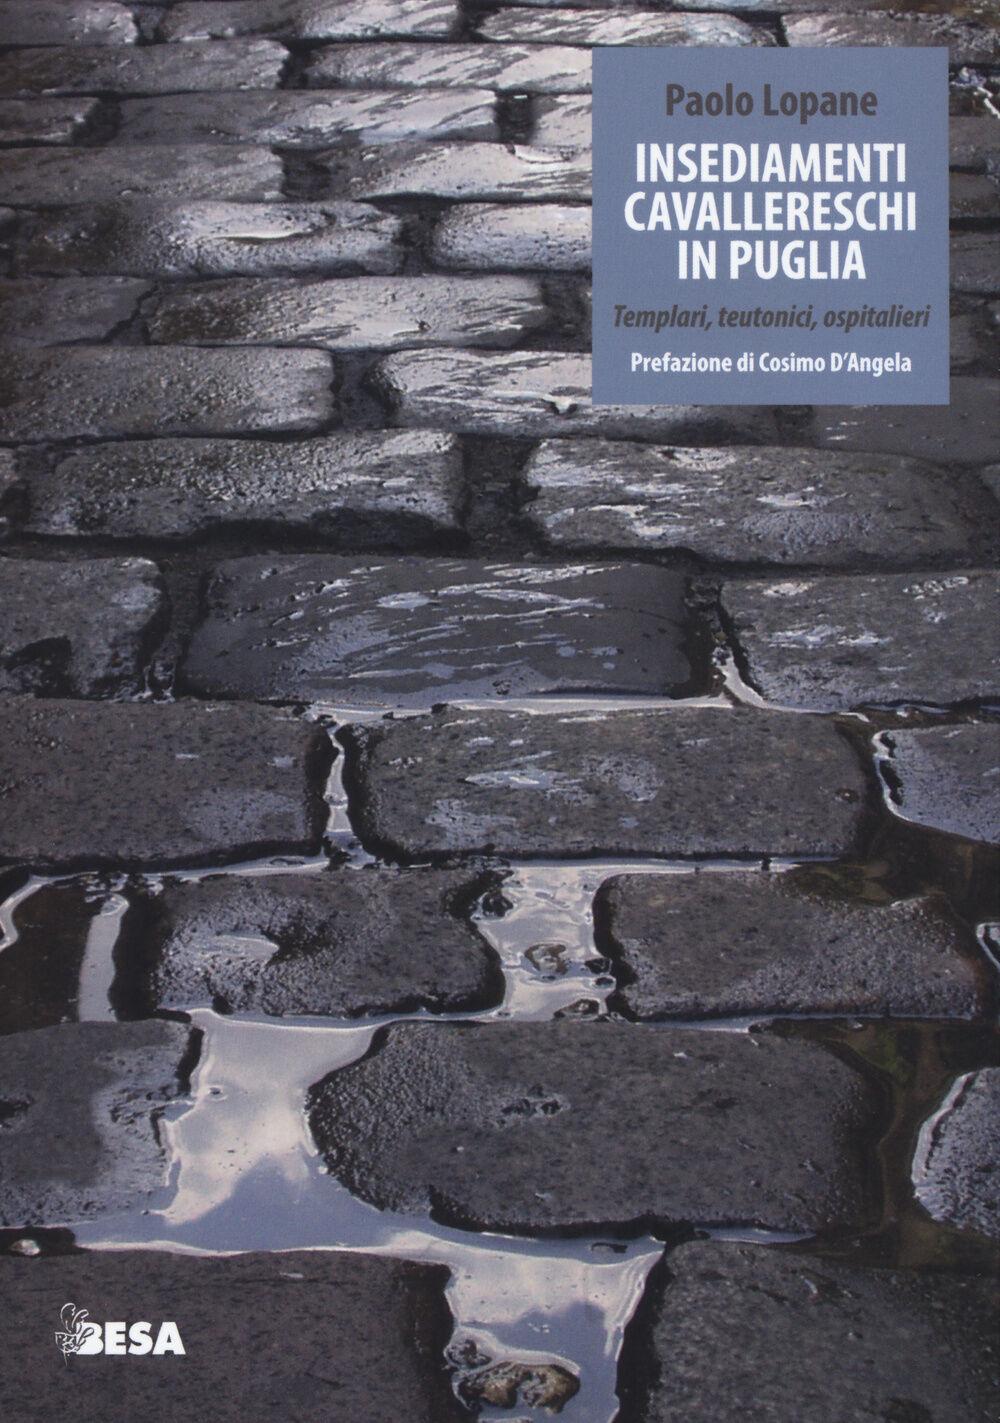 Insediamenti cavallereschi in Puglia. Templari, teutonici, ospitalieri